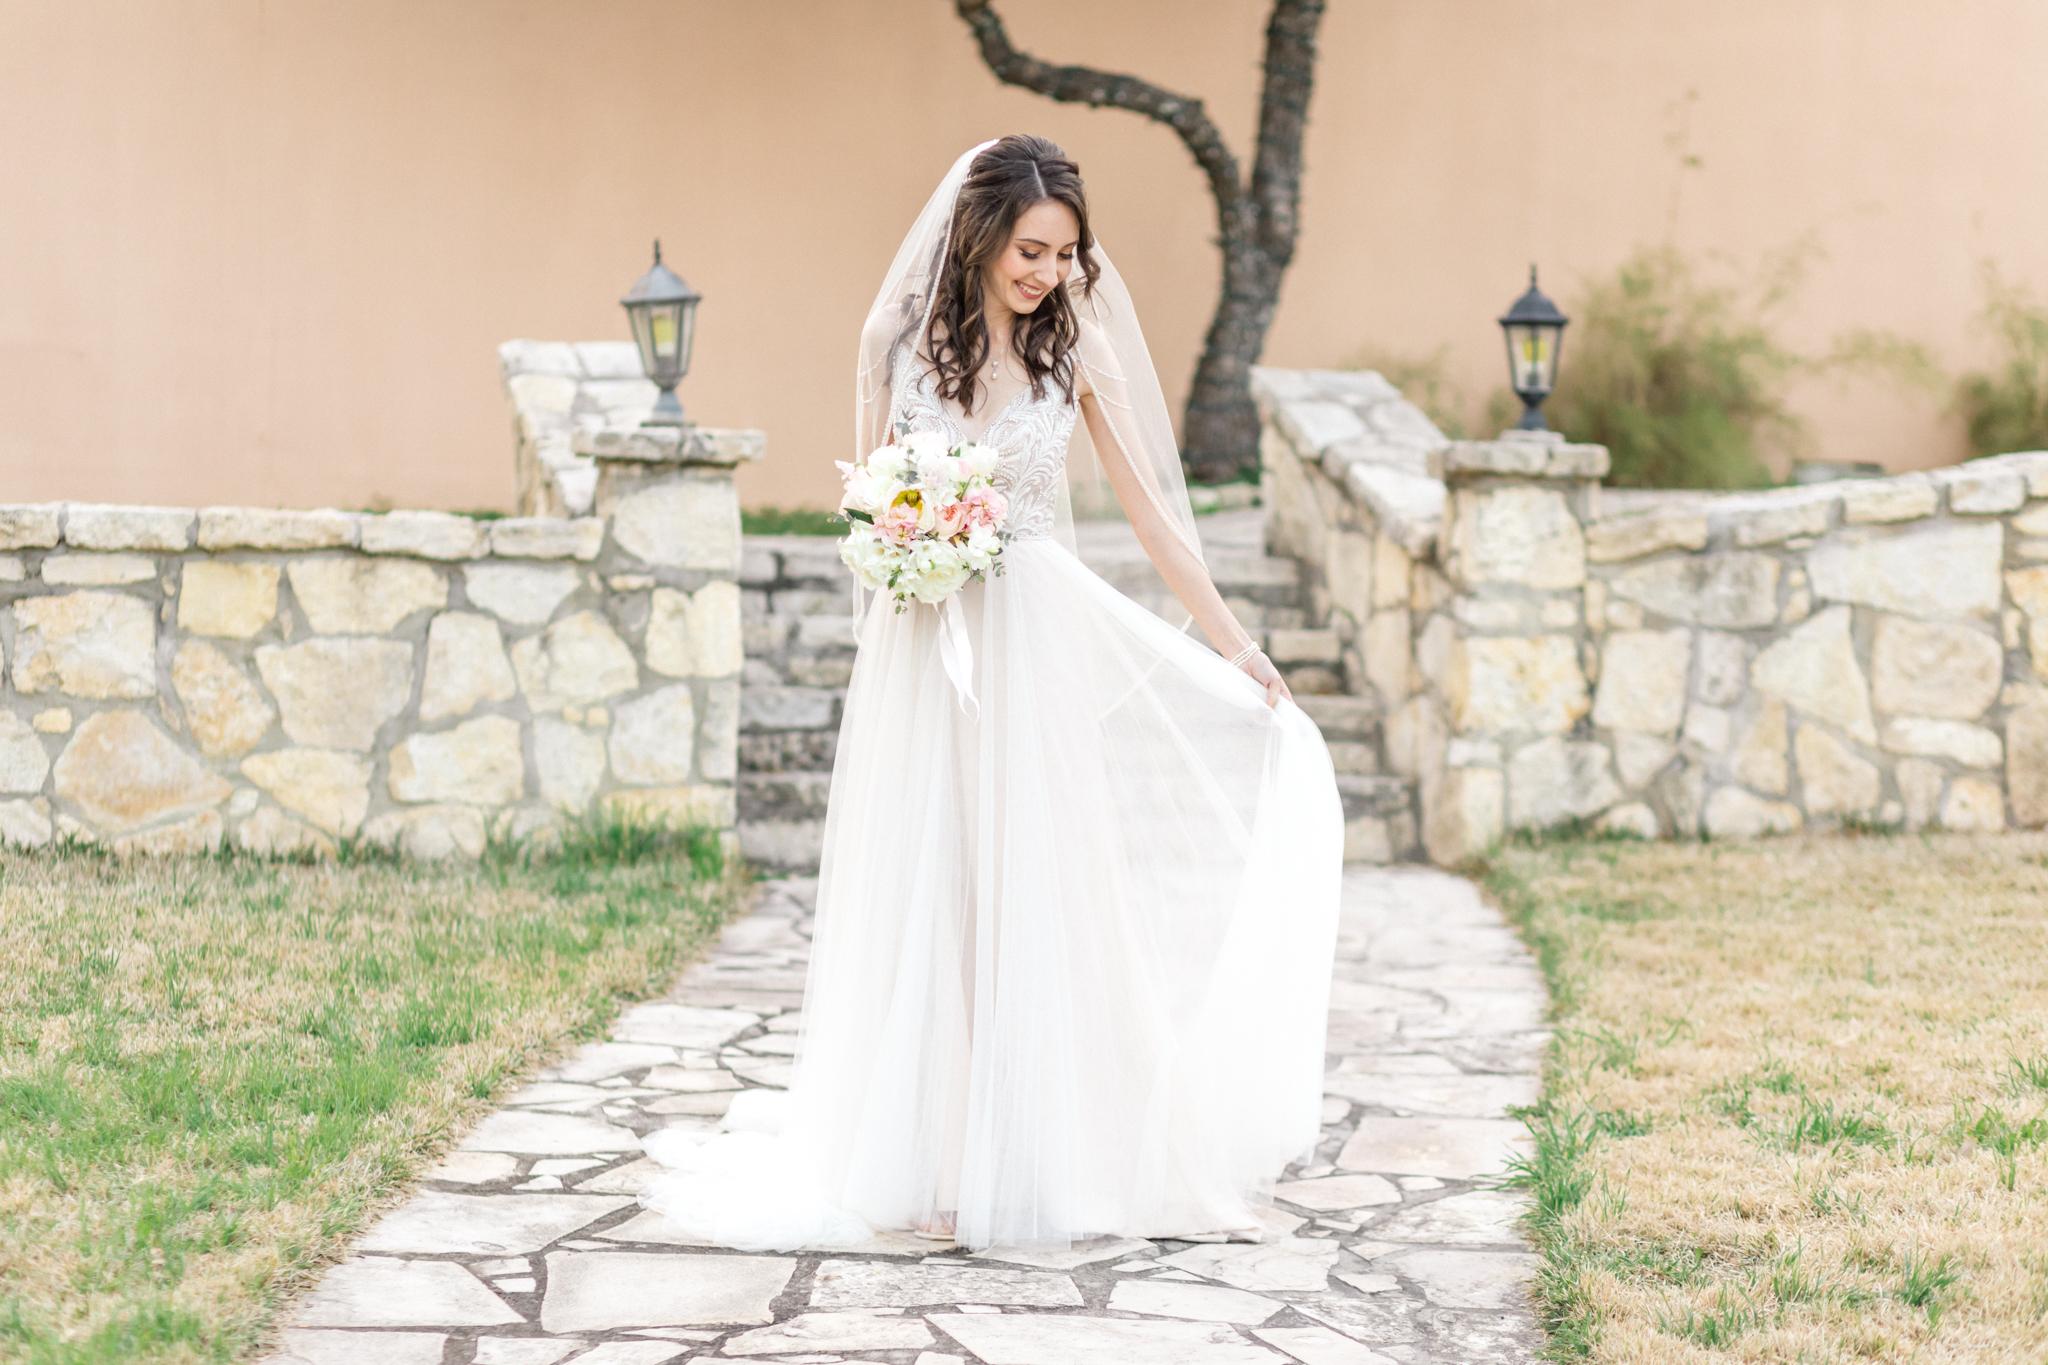 San Antonio Helotes Boerne Fredericksburg Austin Texas hill country Wedding Engagement Photographer bridal session bridal photos San Antonio bride bridals Scenic Springs wedding venue